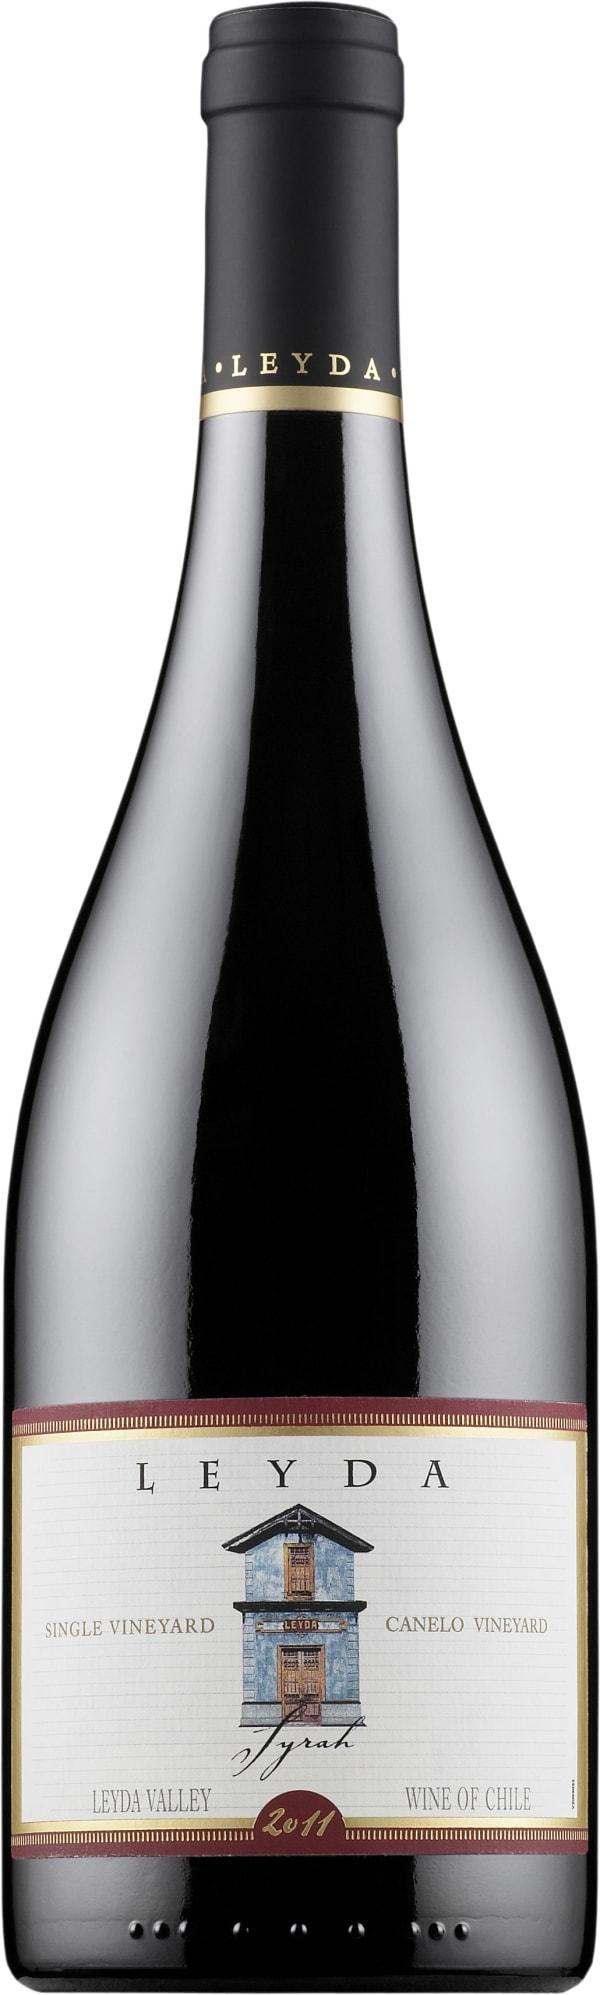 Leyda Single Vineyard Canelo Syrah 2013